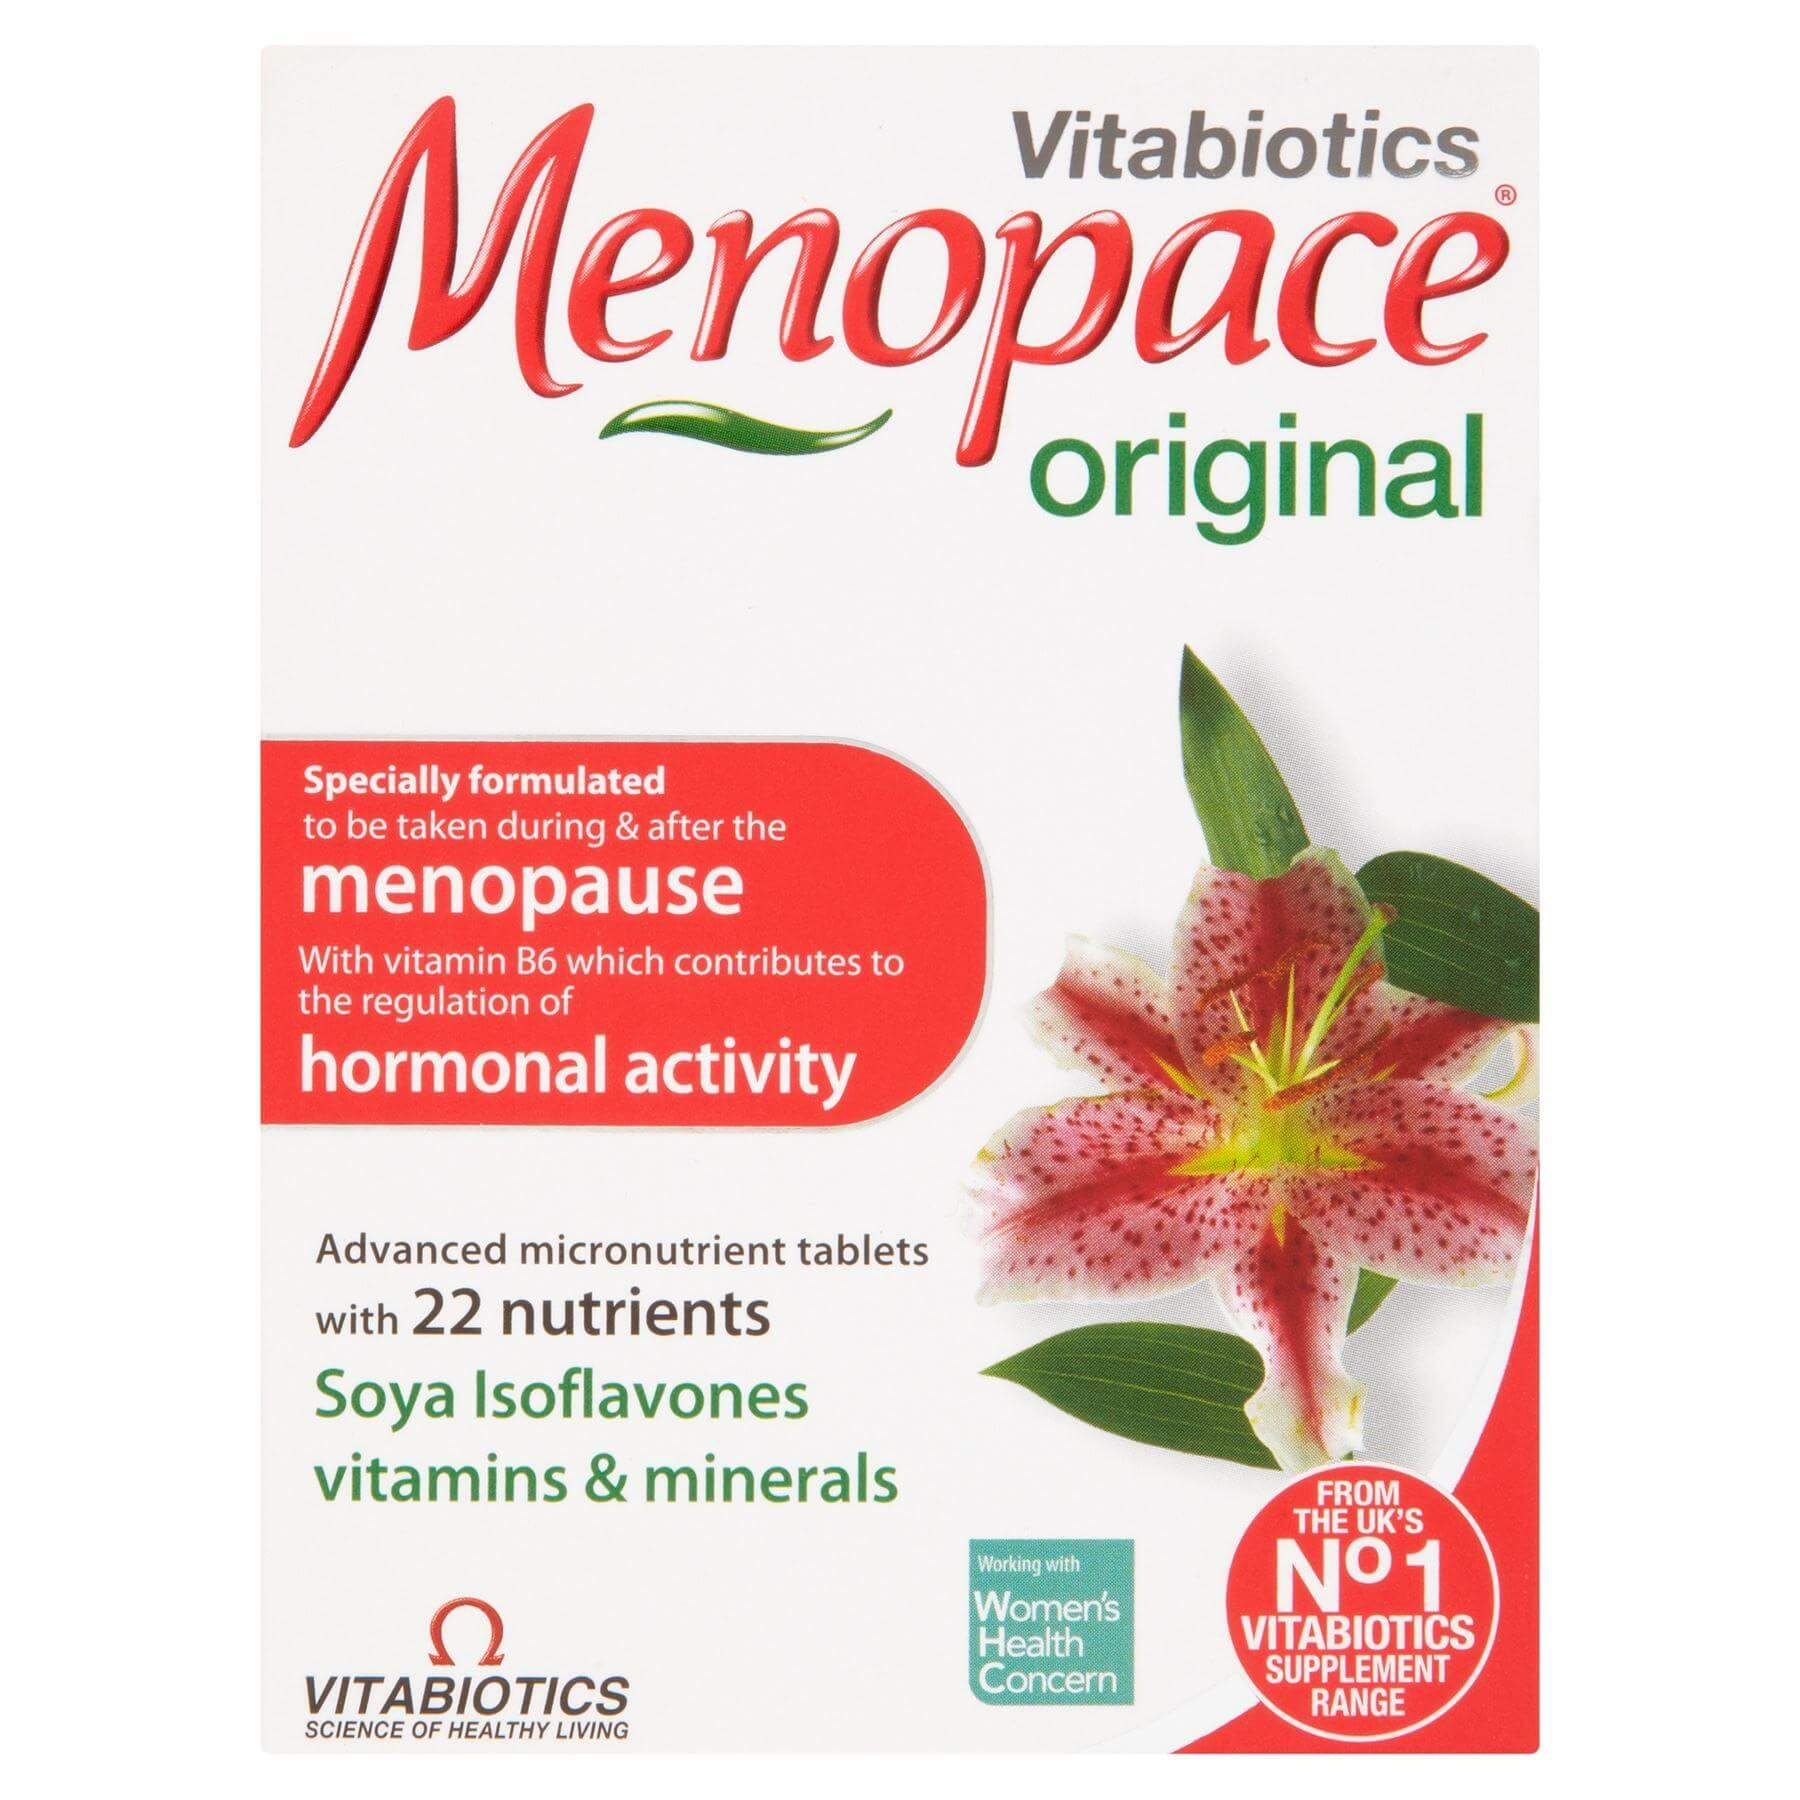 Vitabiotics Menopace Original Πριν Κατά Τη Διάρκεια Και Μετά Την Εμμηνόπαυση 30Caps